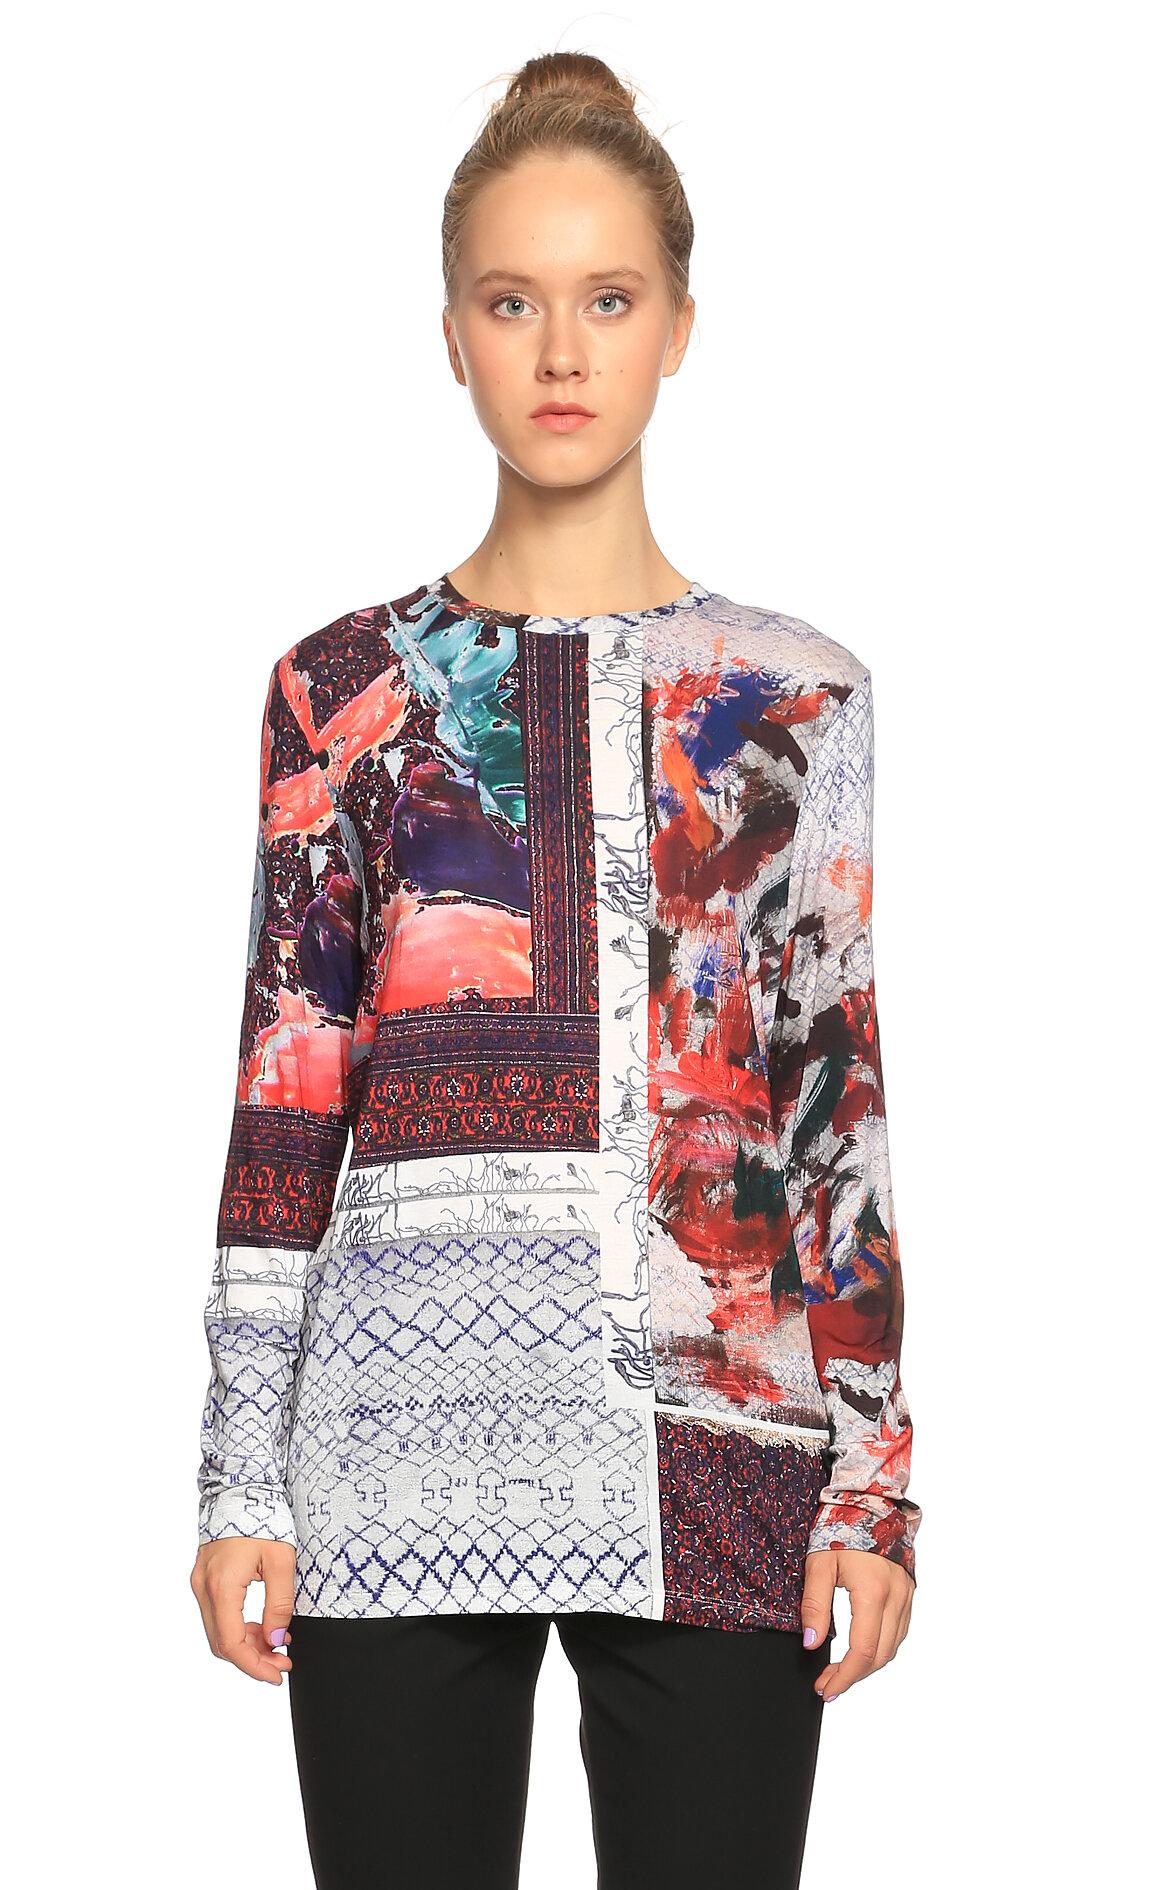 Prabal Gurung-Prabal Gurung Desenli Uzun Kollu Çok Renkli  Bluz